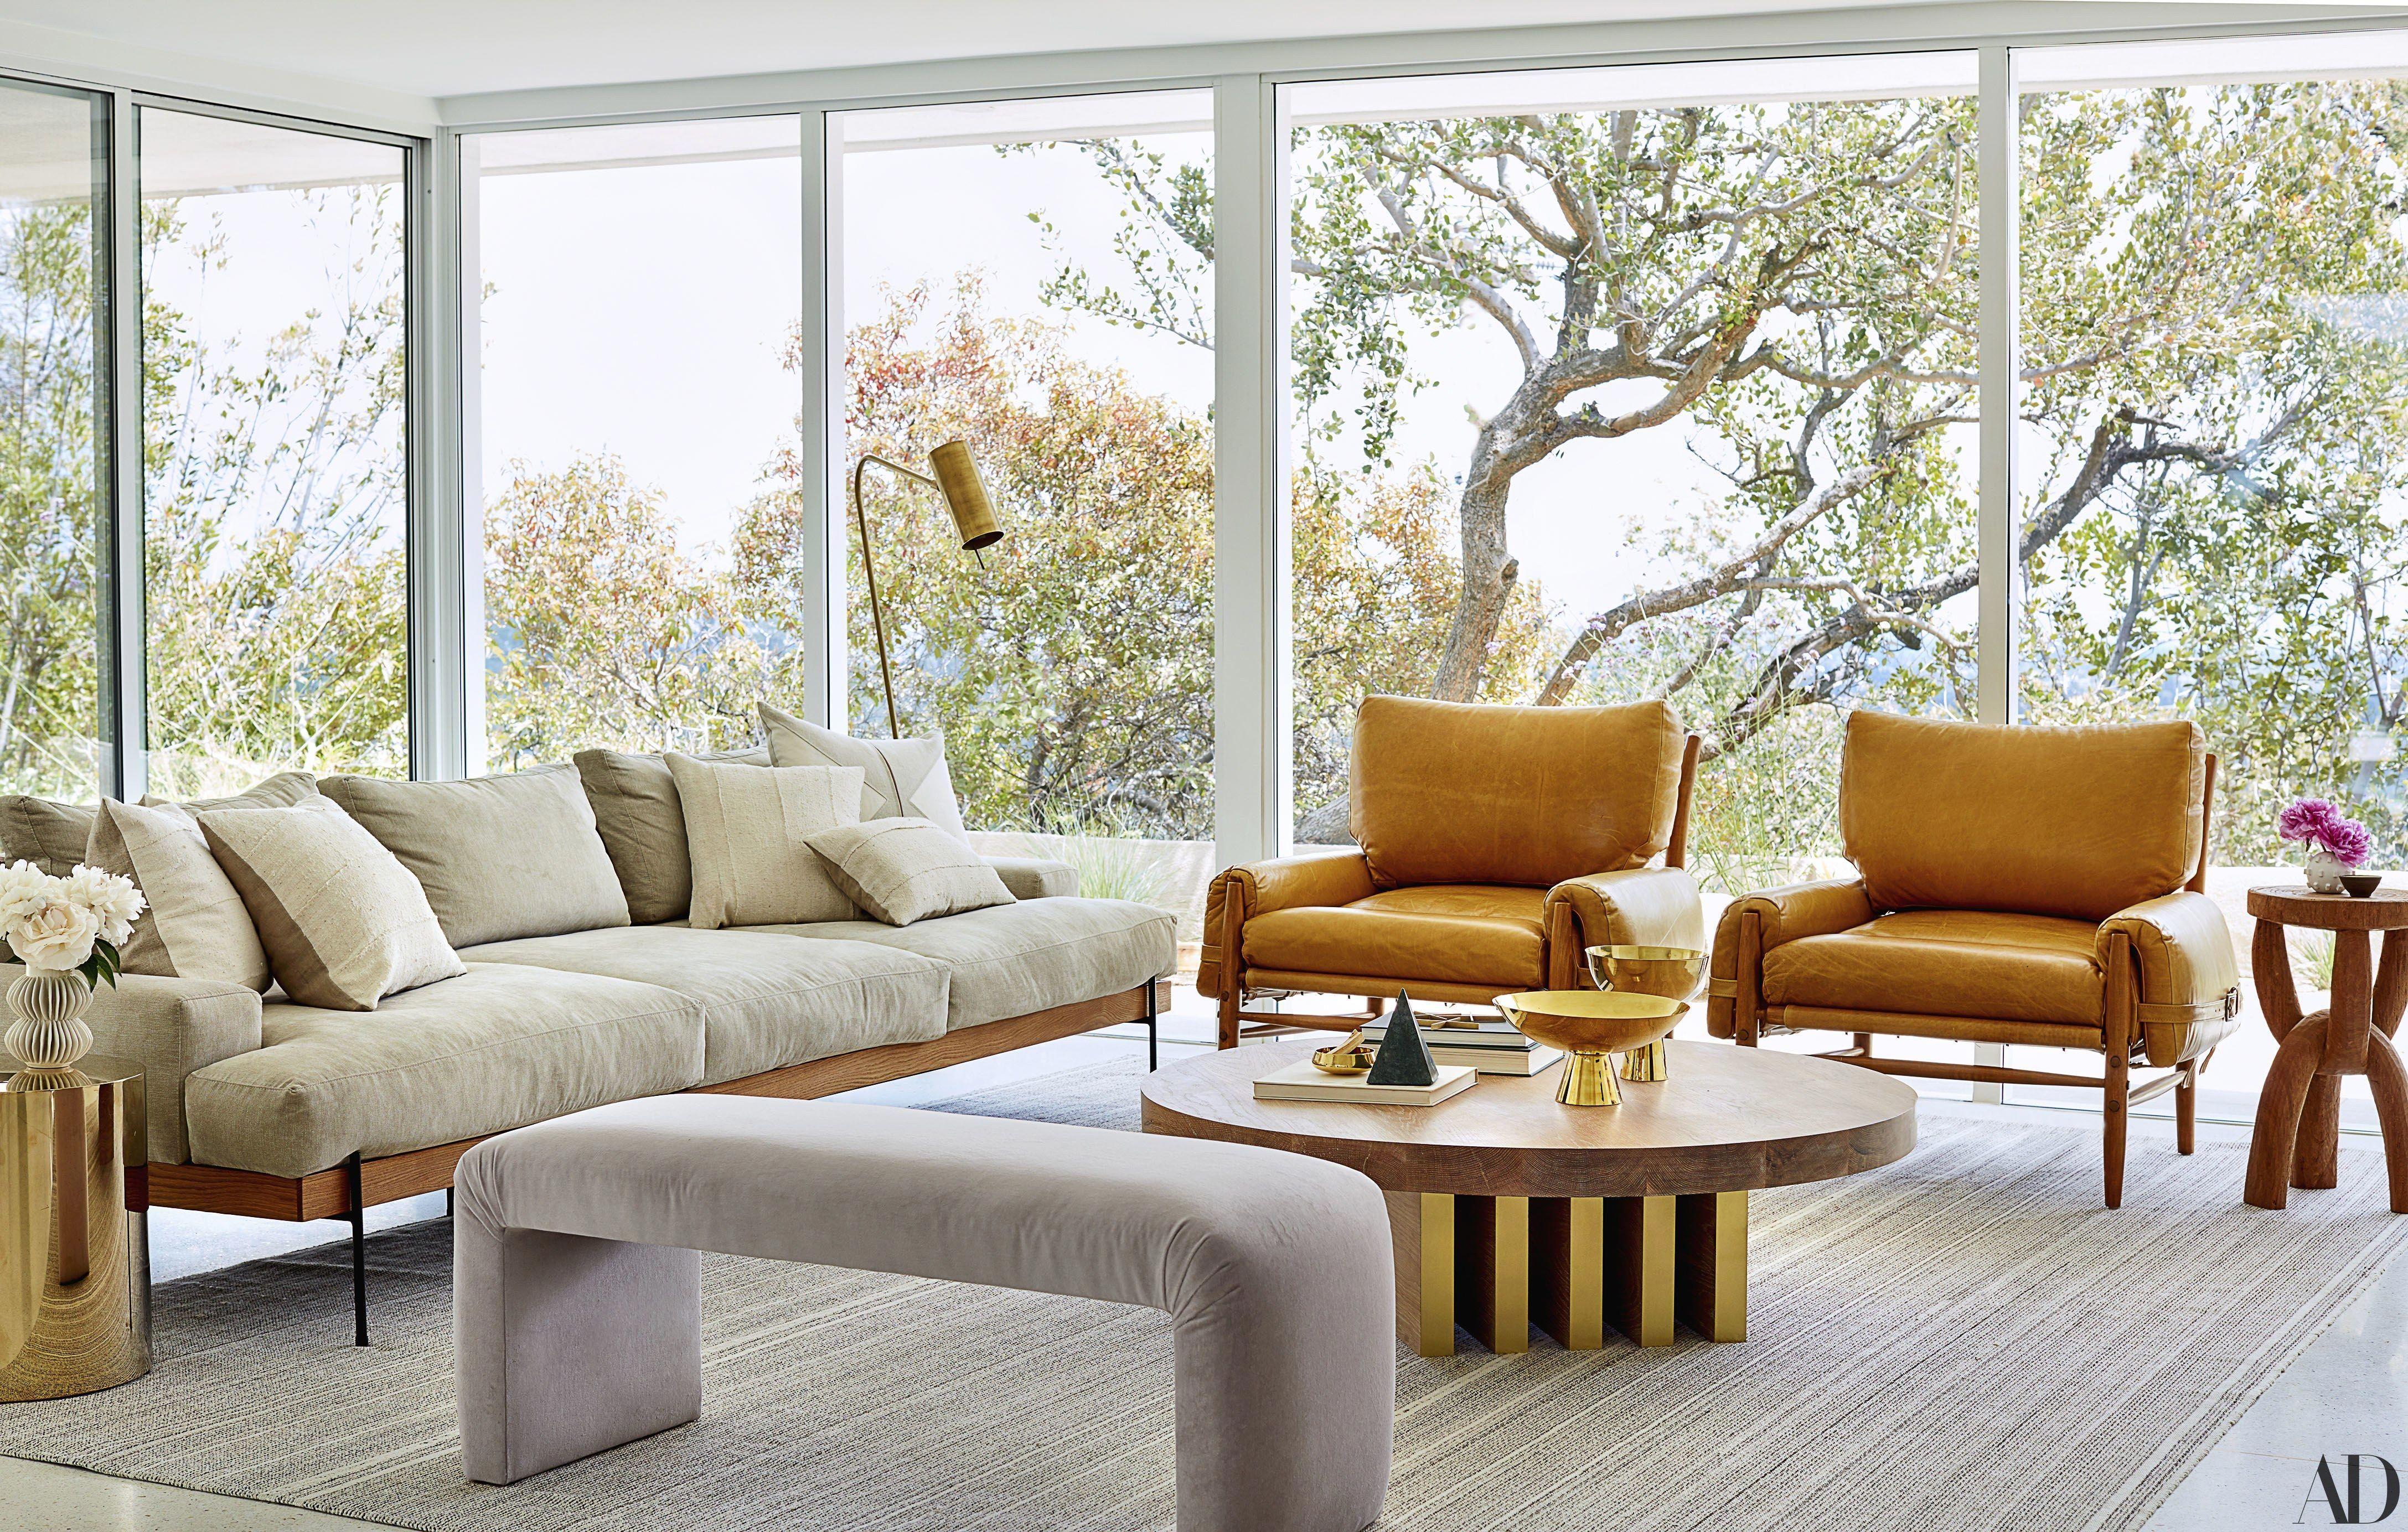 Habitual Living Room Furniture On A Budget Hometown Homefurniturefloors Lila Wohnzimmer Haus Deko Wohnzimmer Design